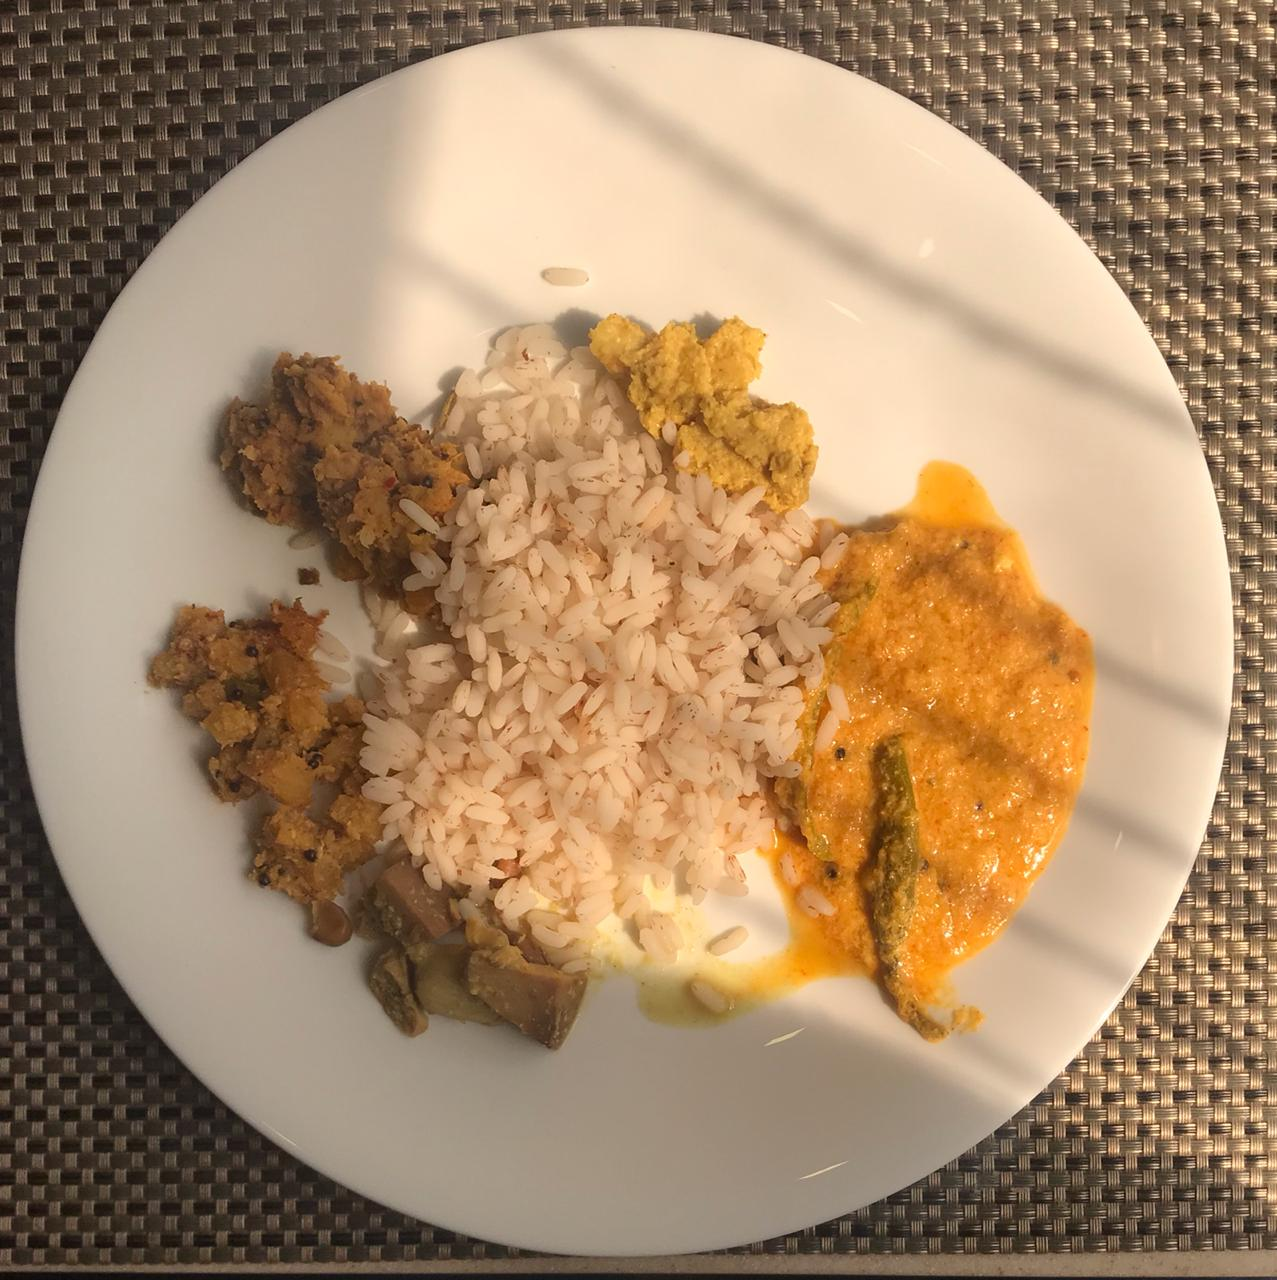 Kerala Food Olives Restaurant Chennai Veg Buffet.jpeg